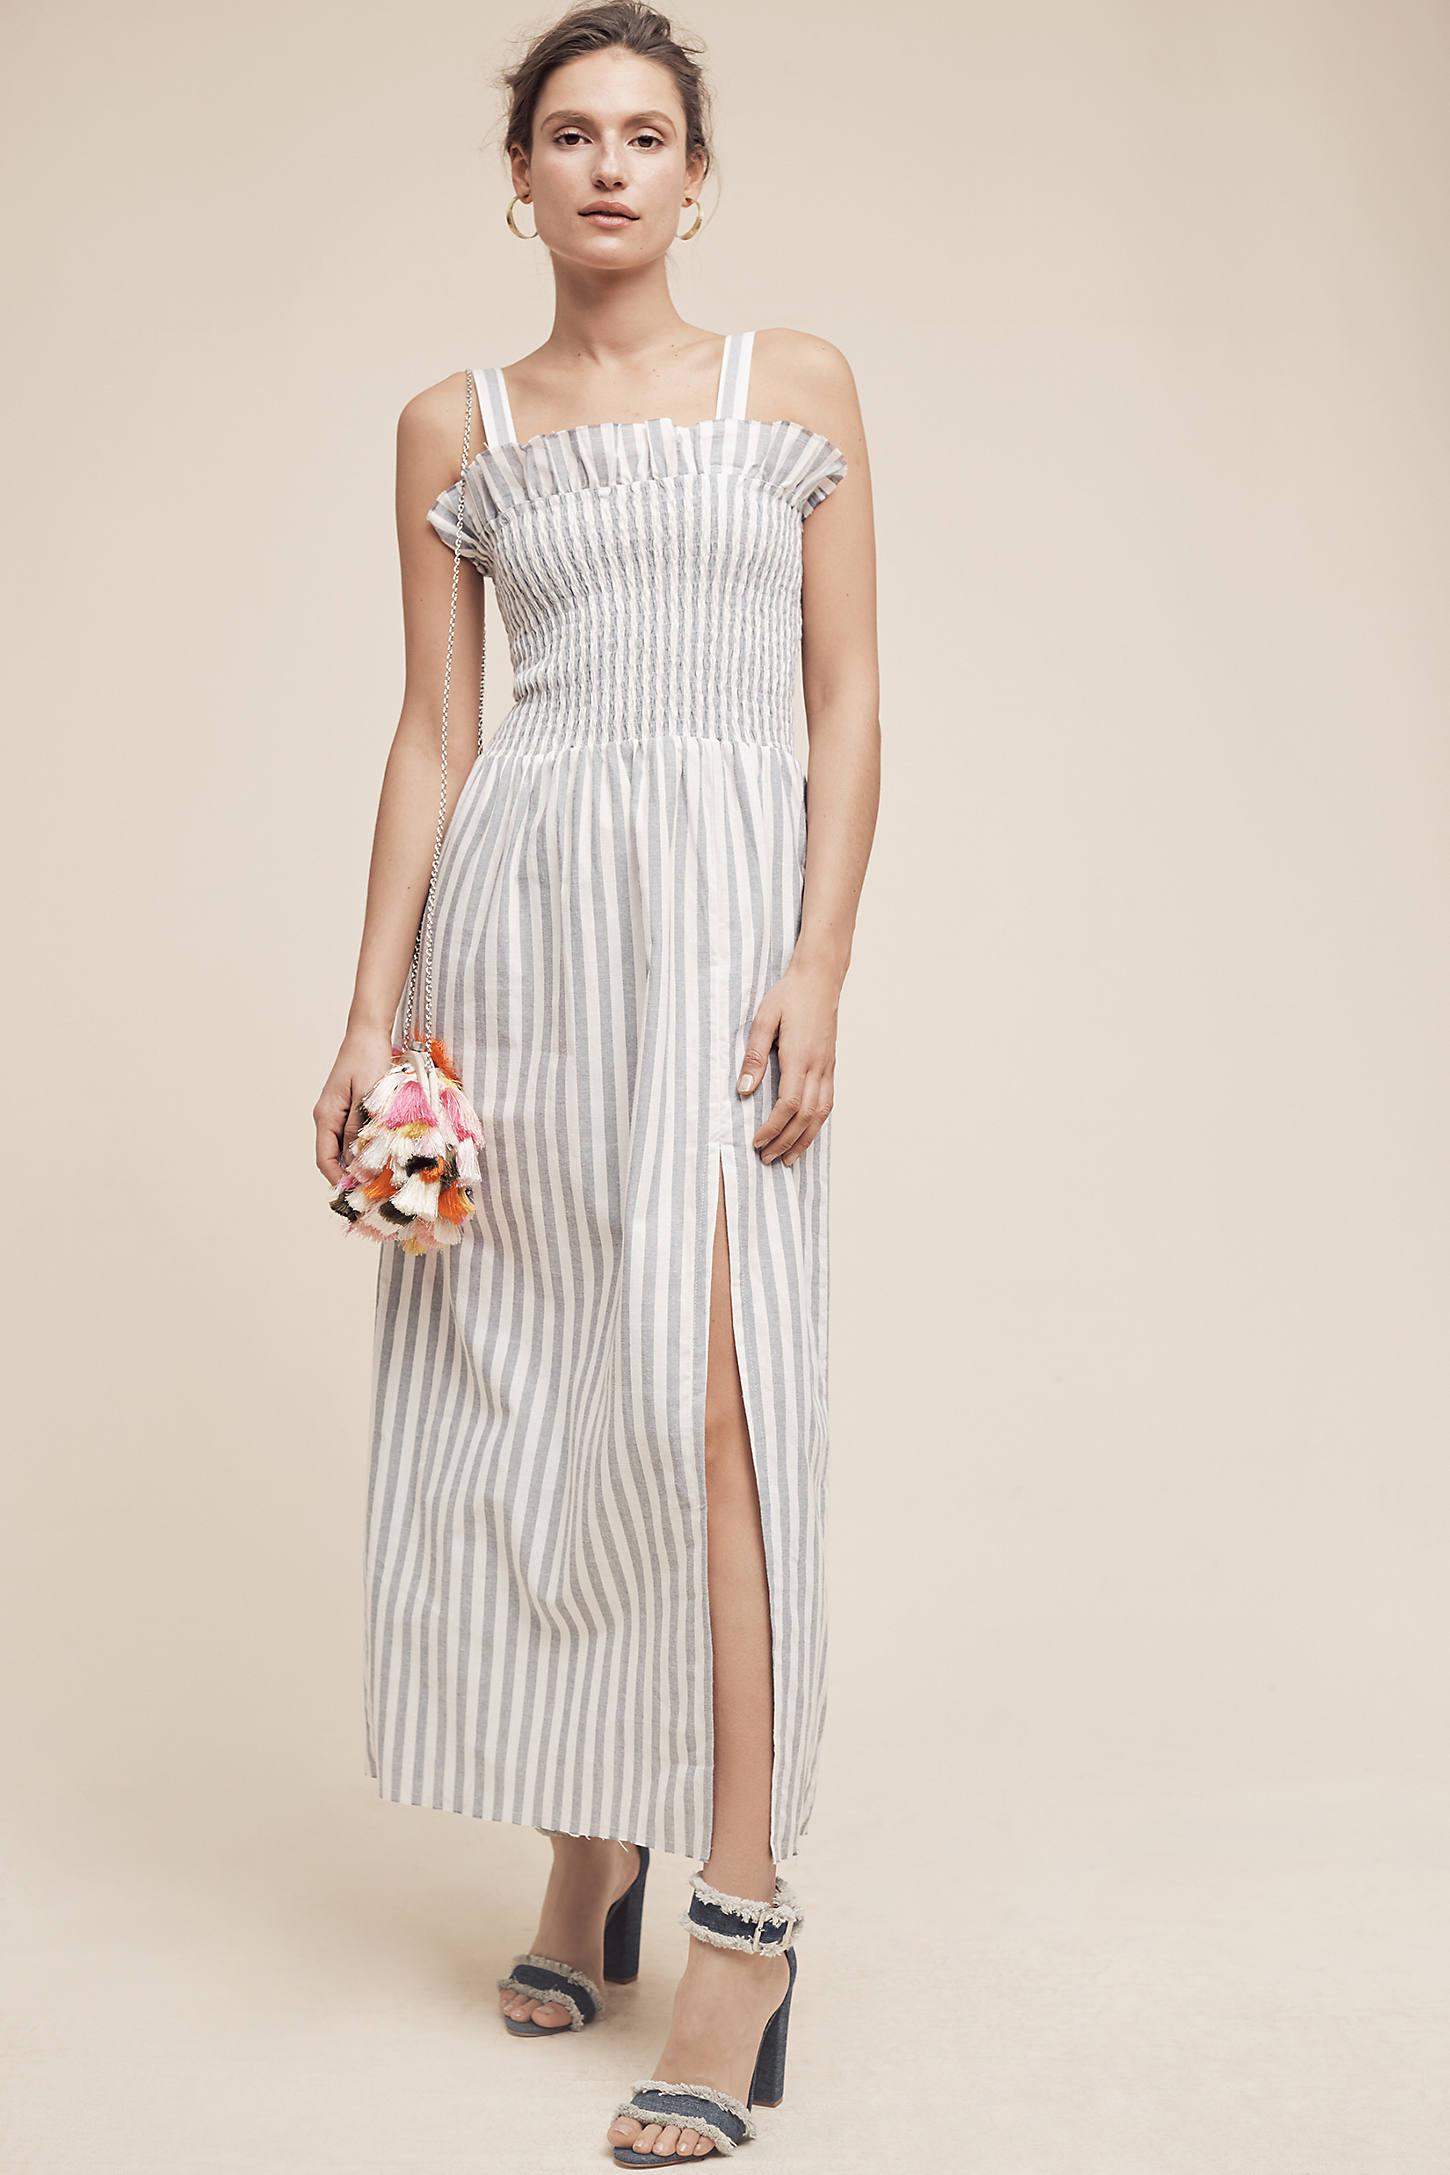 Smocked & Striped Maxi Dress